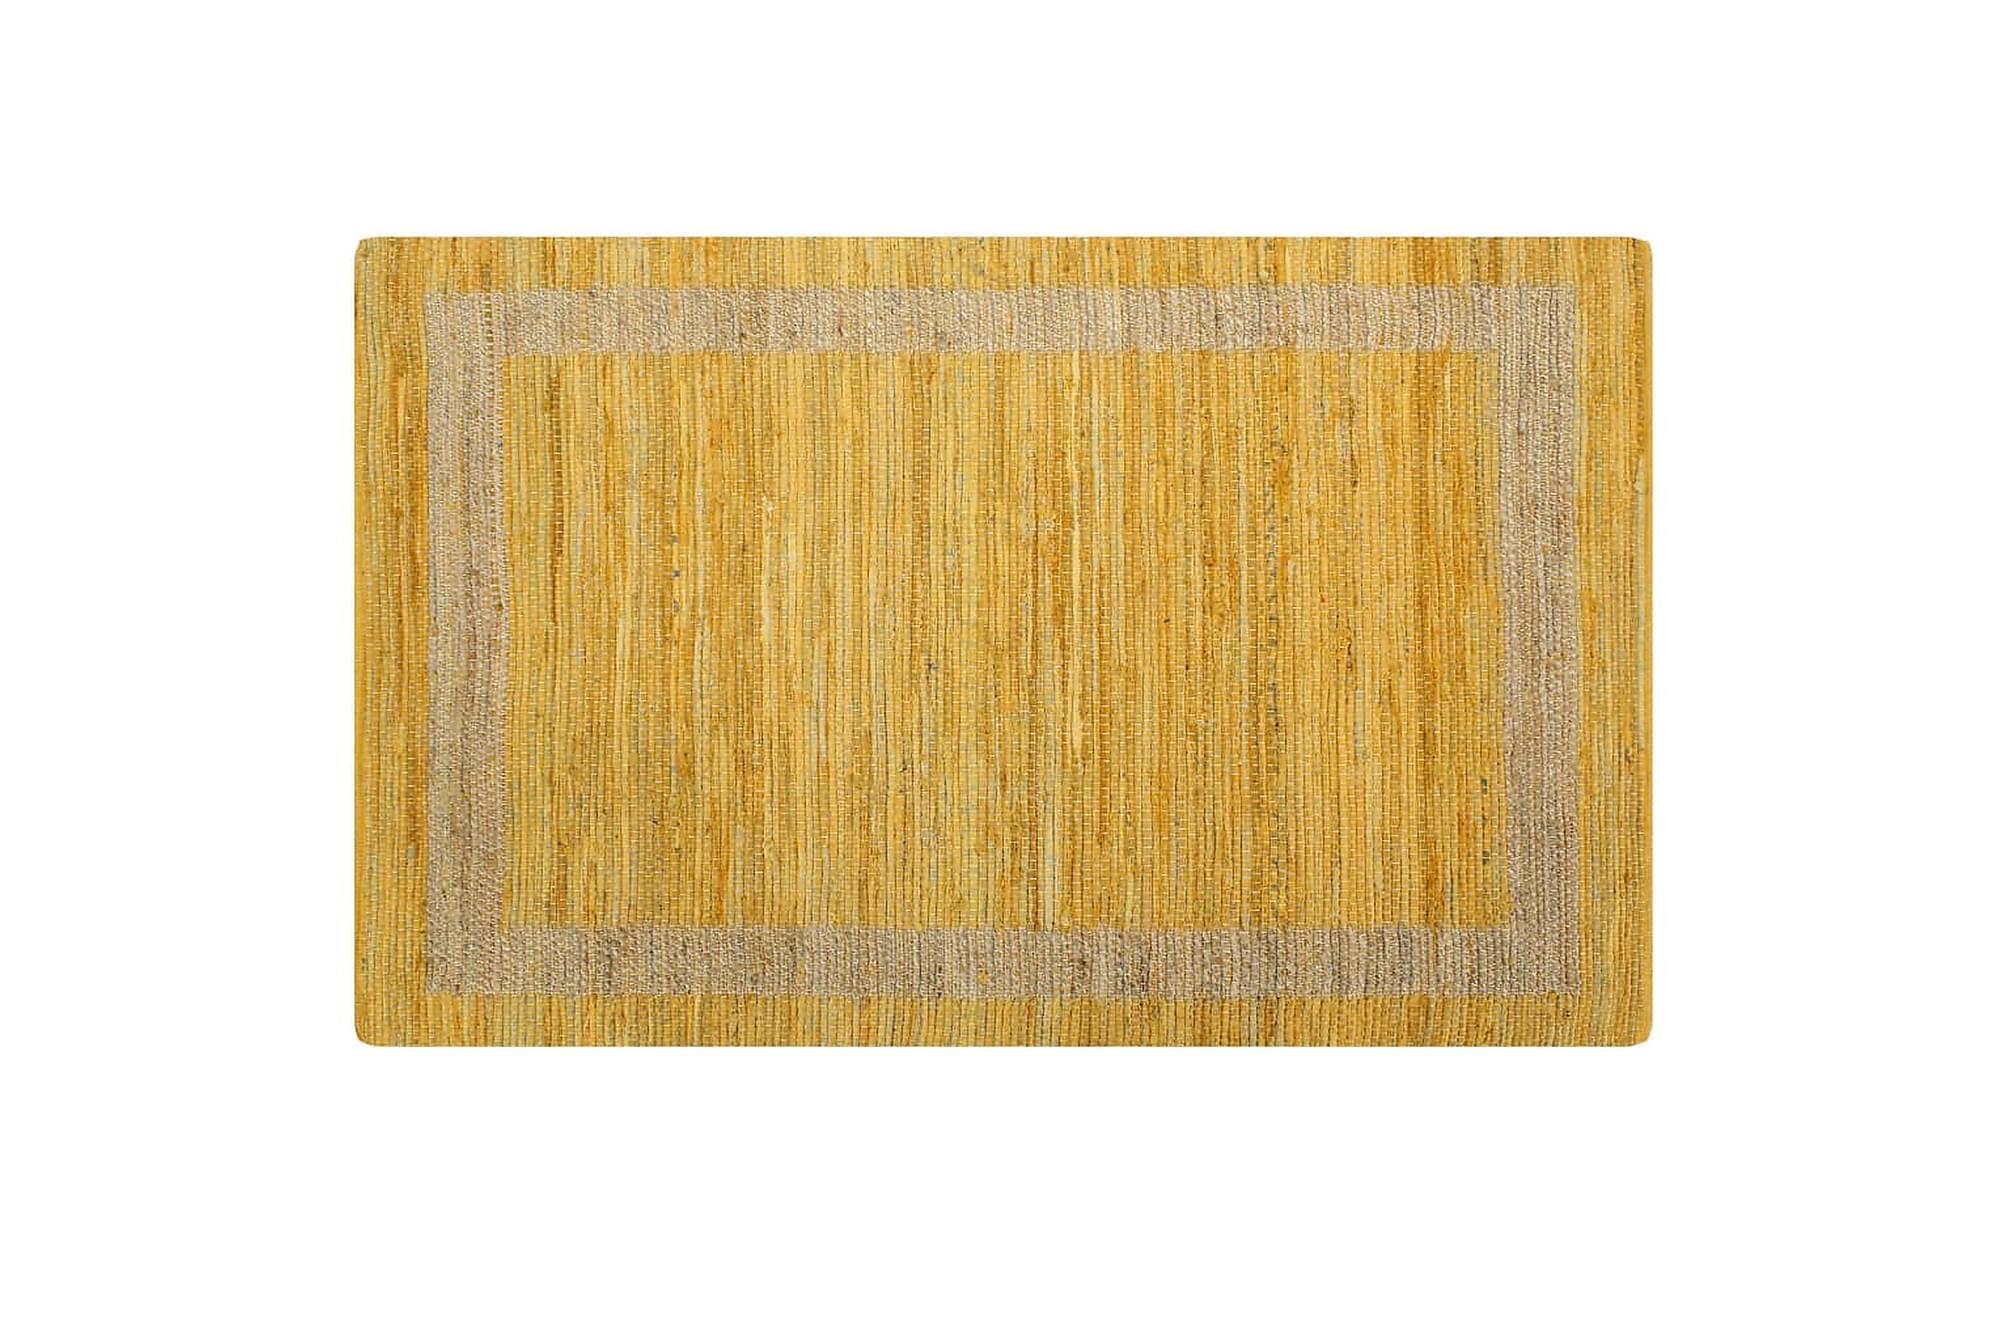 Handgjord jutematta gul 160x230 cm, Handvävda mattor